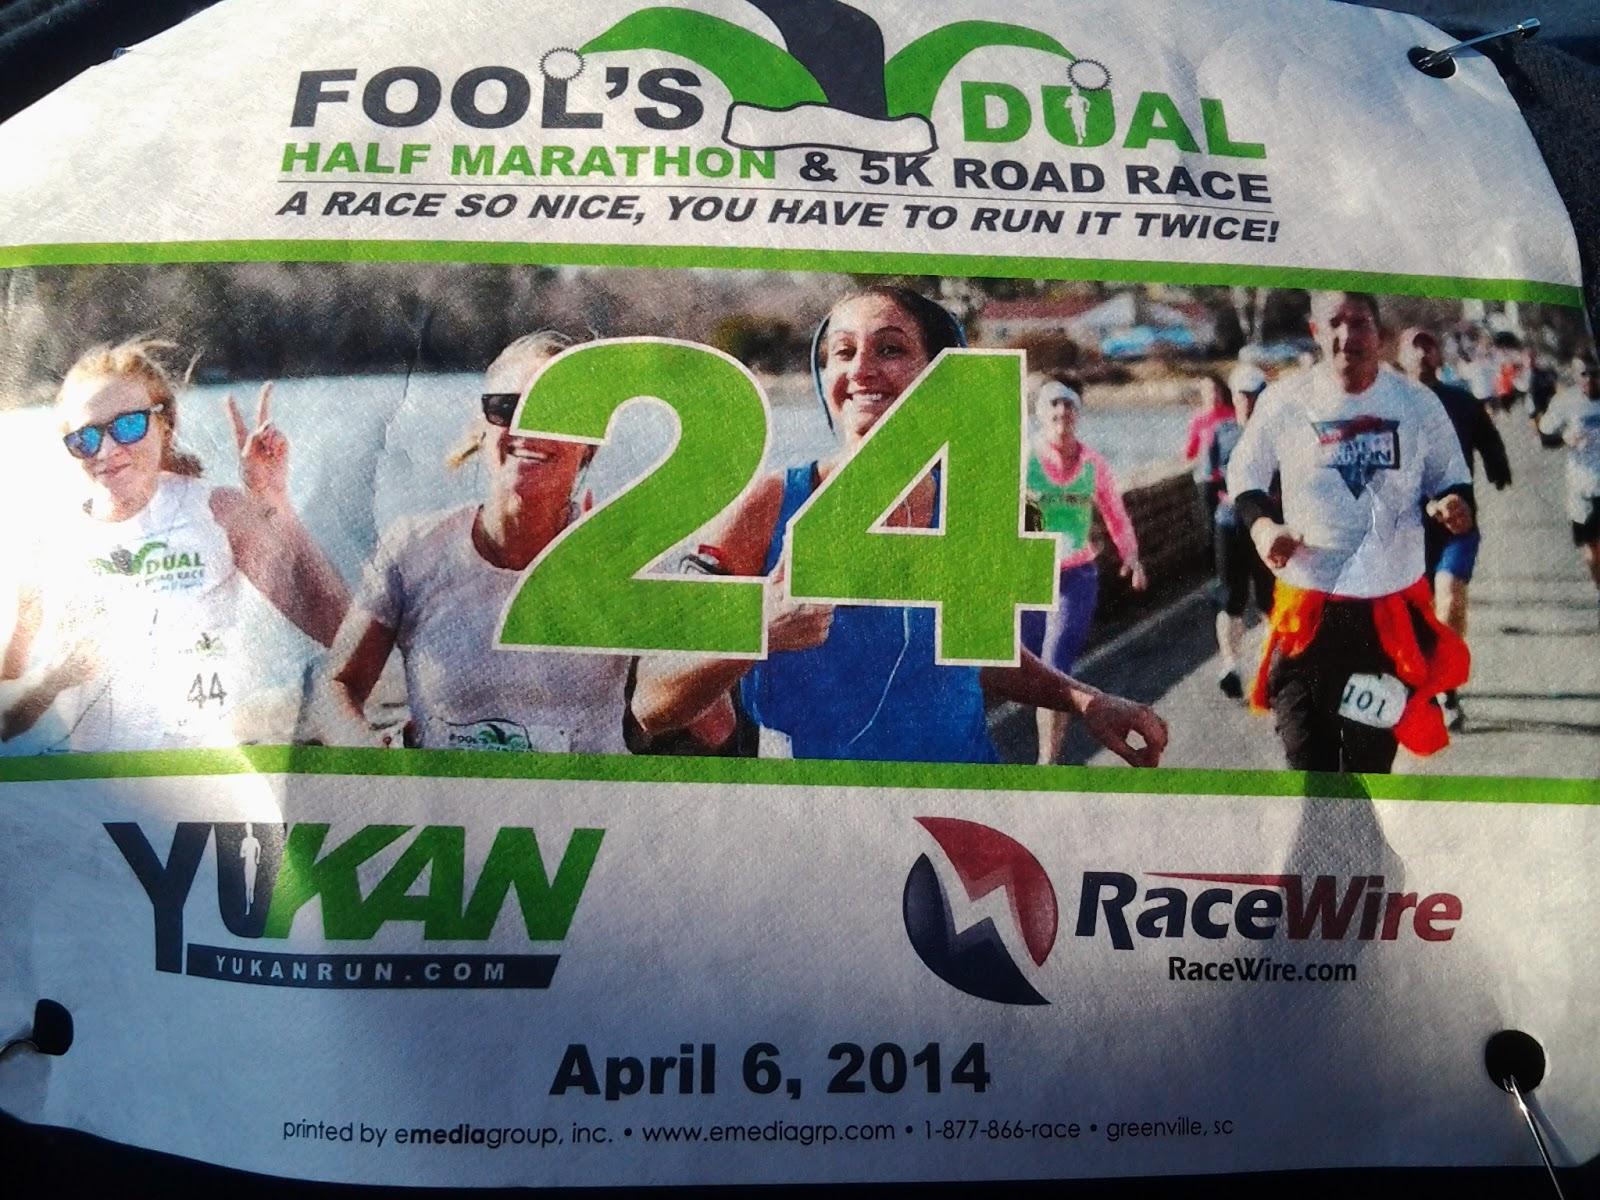 Image: Lance Eaton - Fools Dual Number 24